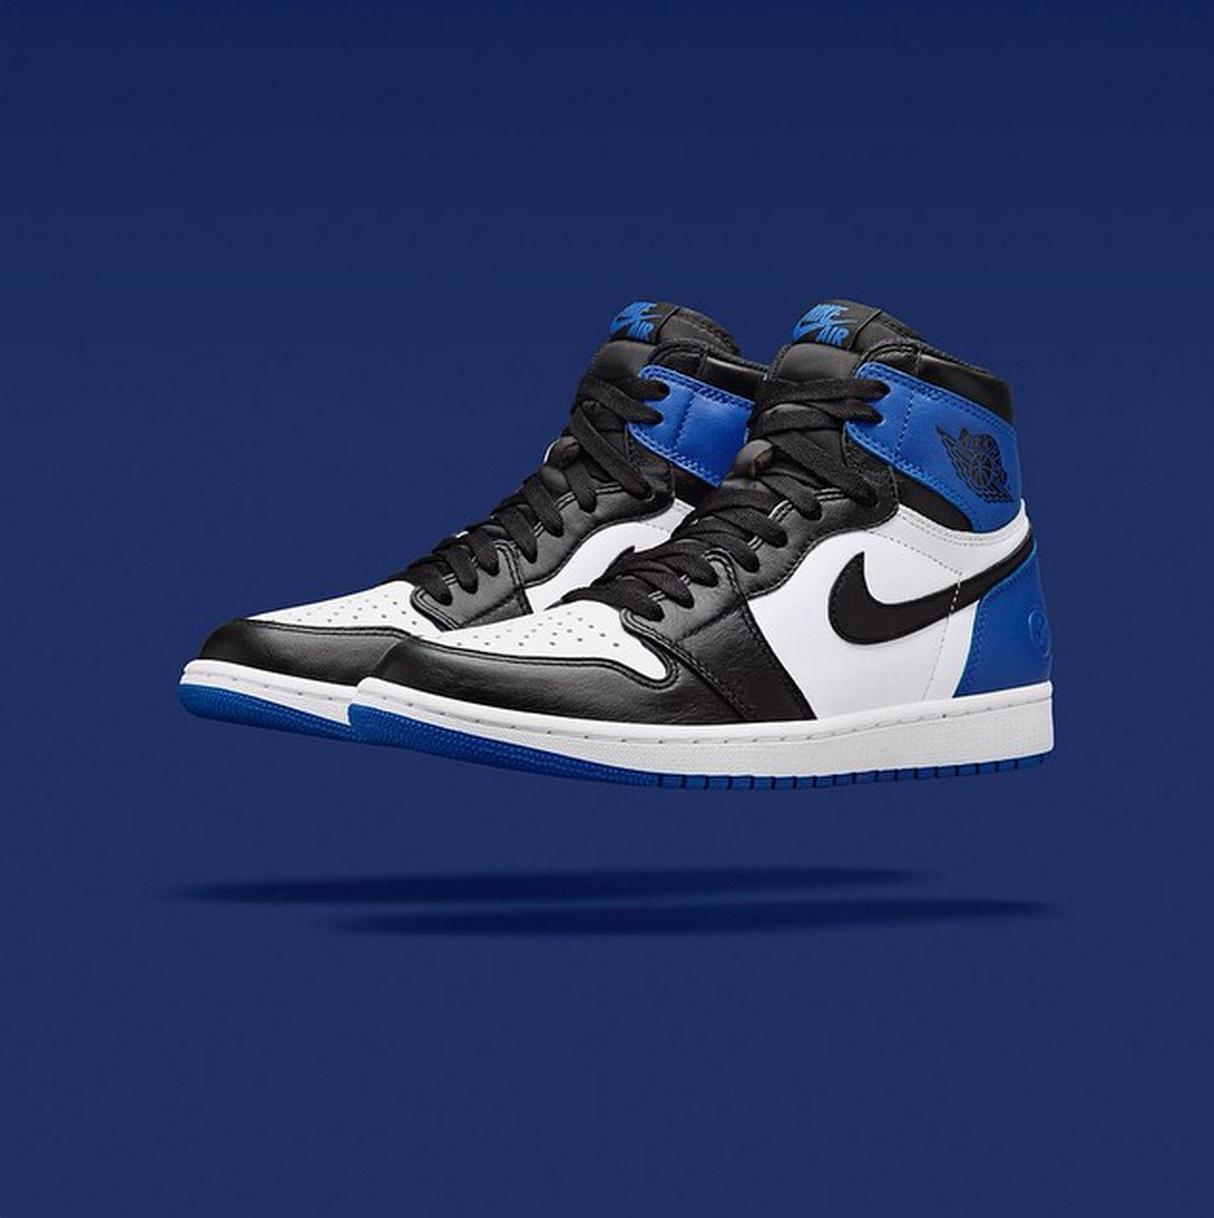 Fragment x Air Jordan 1 Coming to Nike Lab